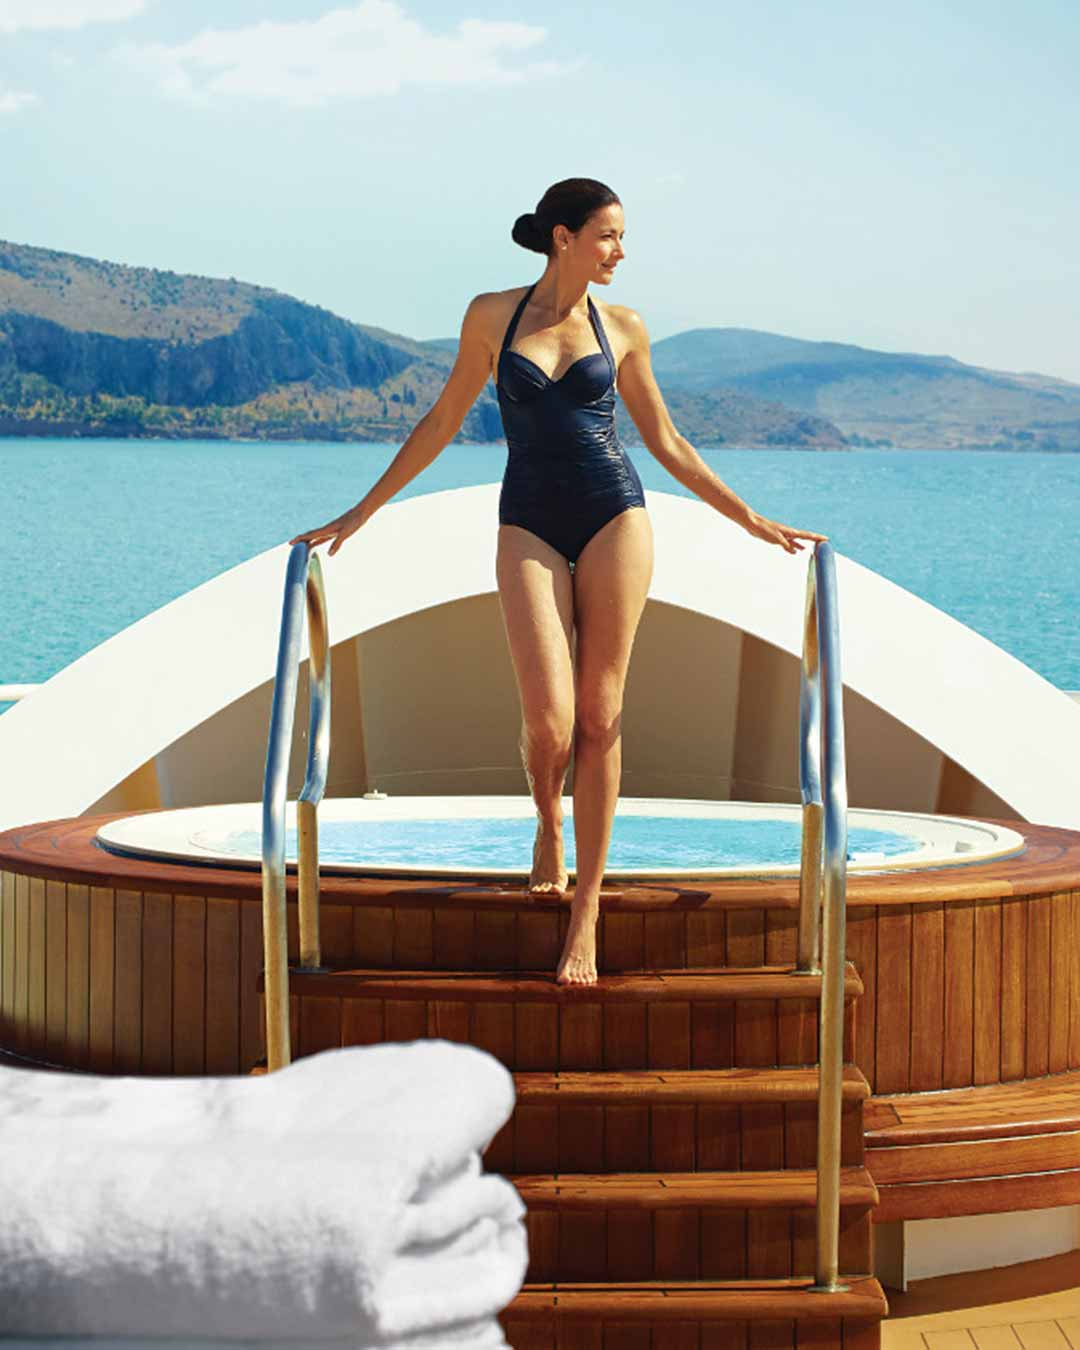 seabourn-cruises-woman-spa-1080x1350